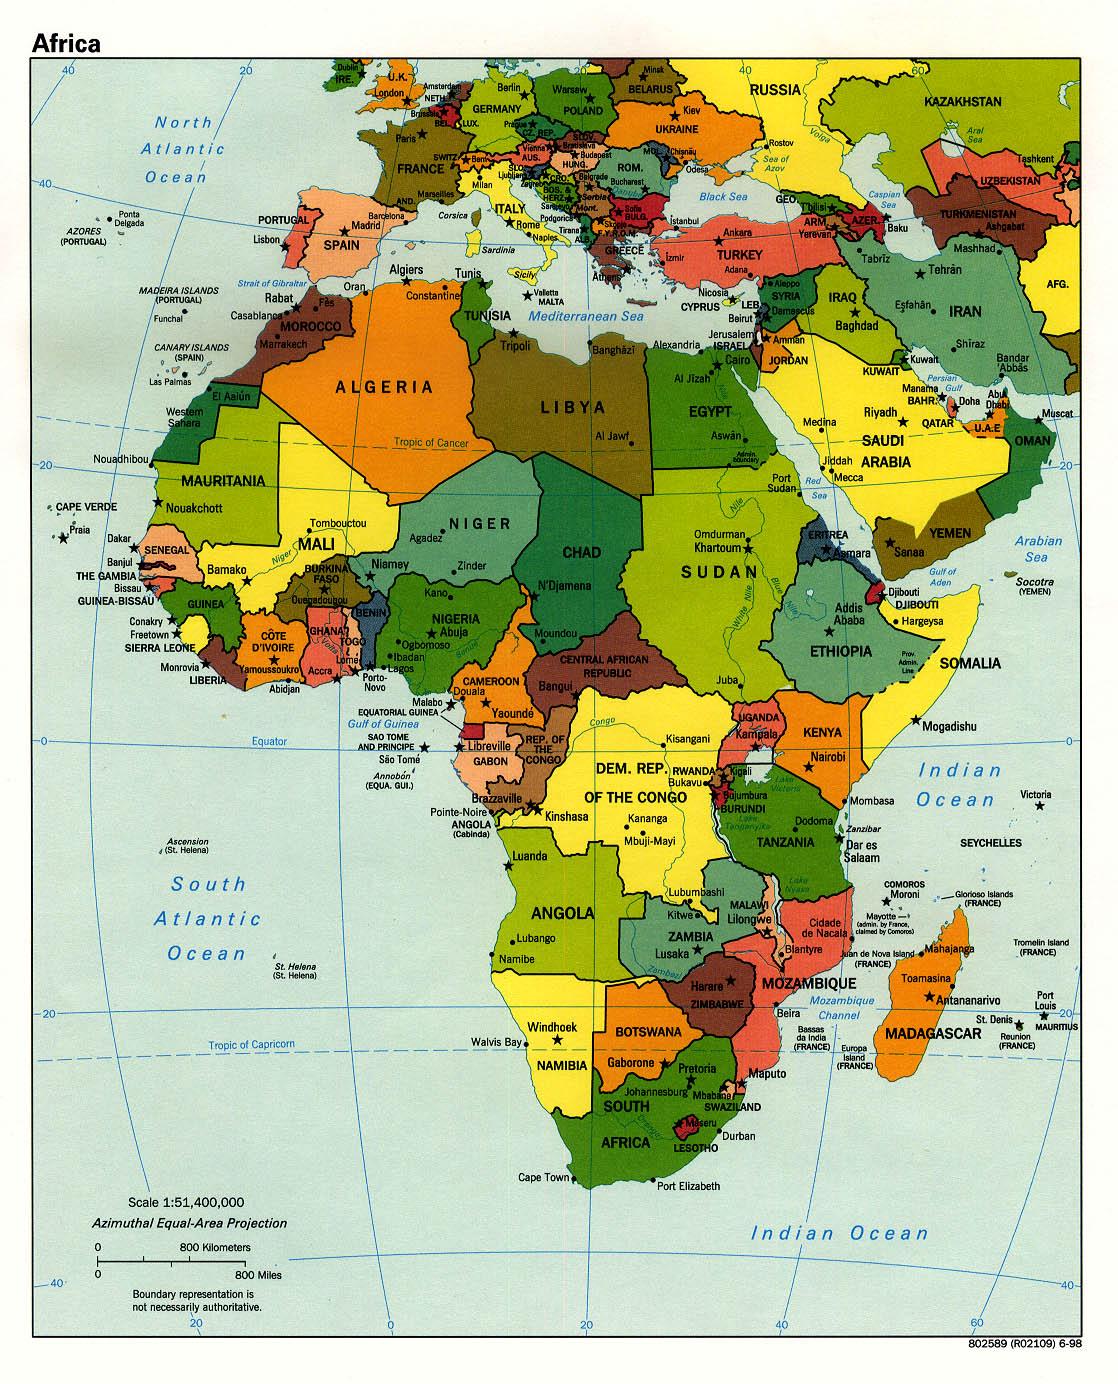 Africa map SC